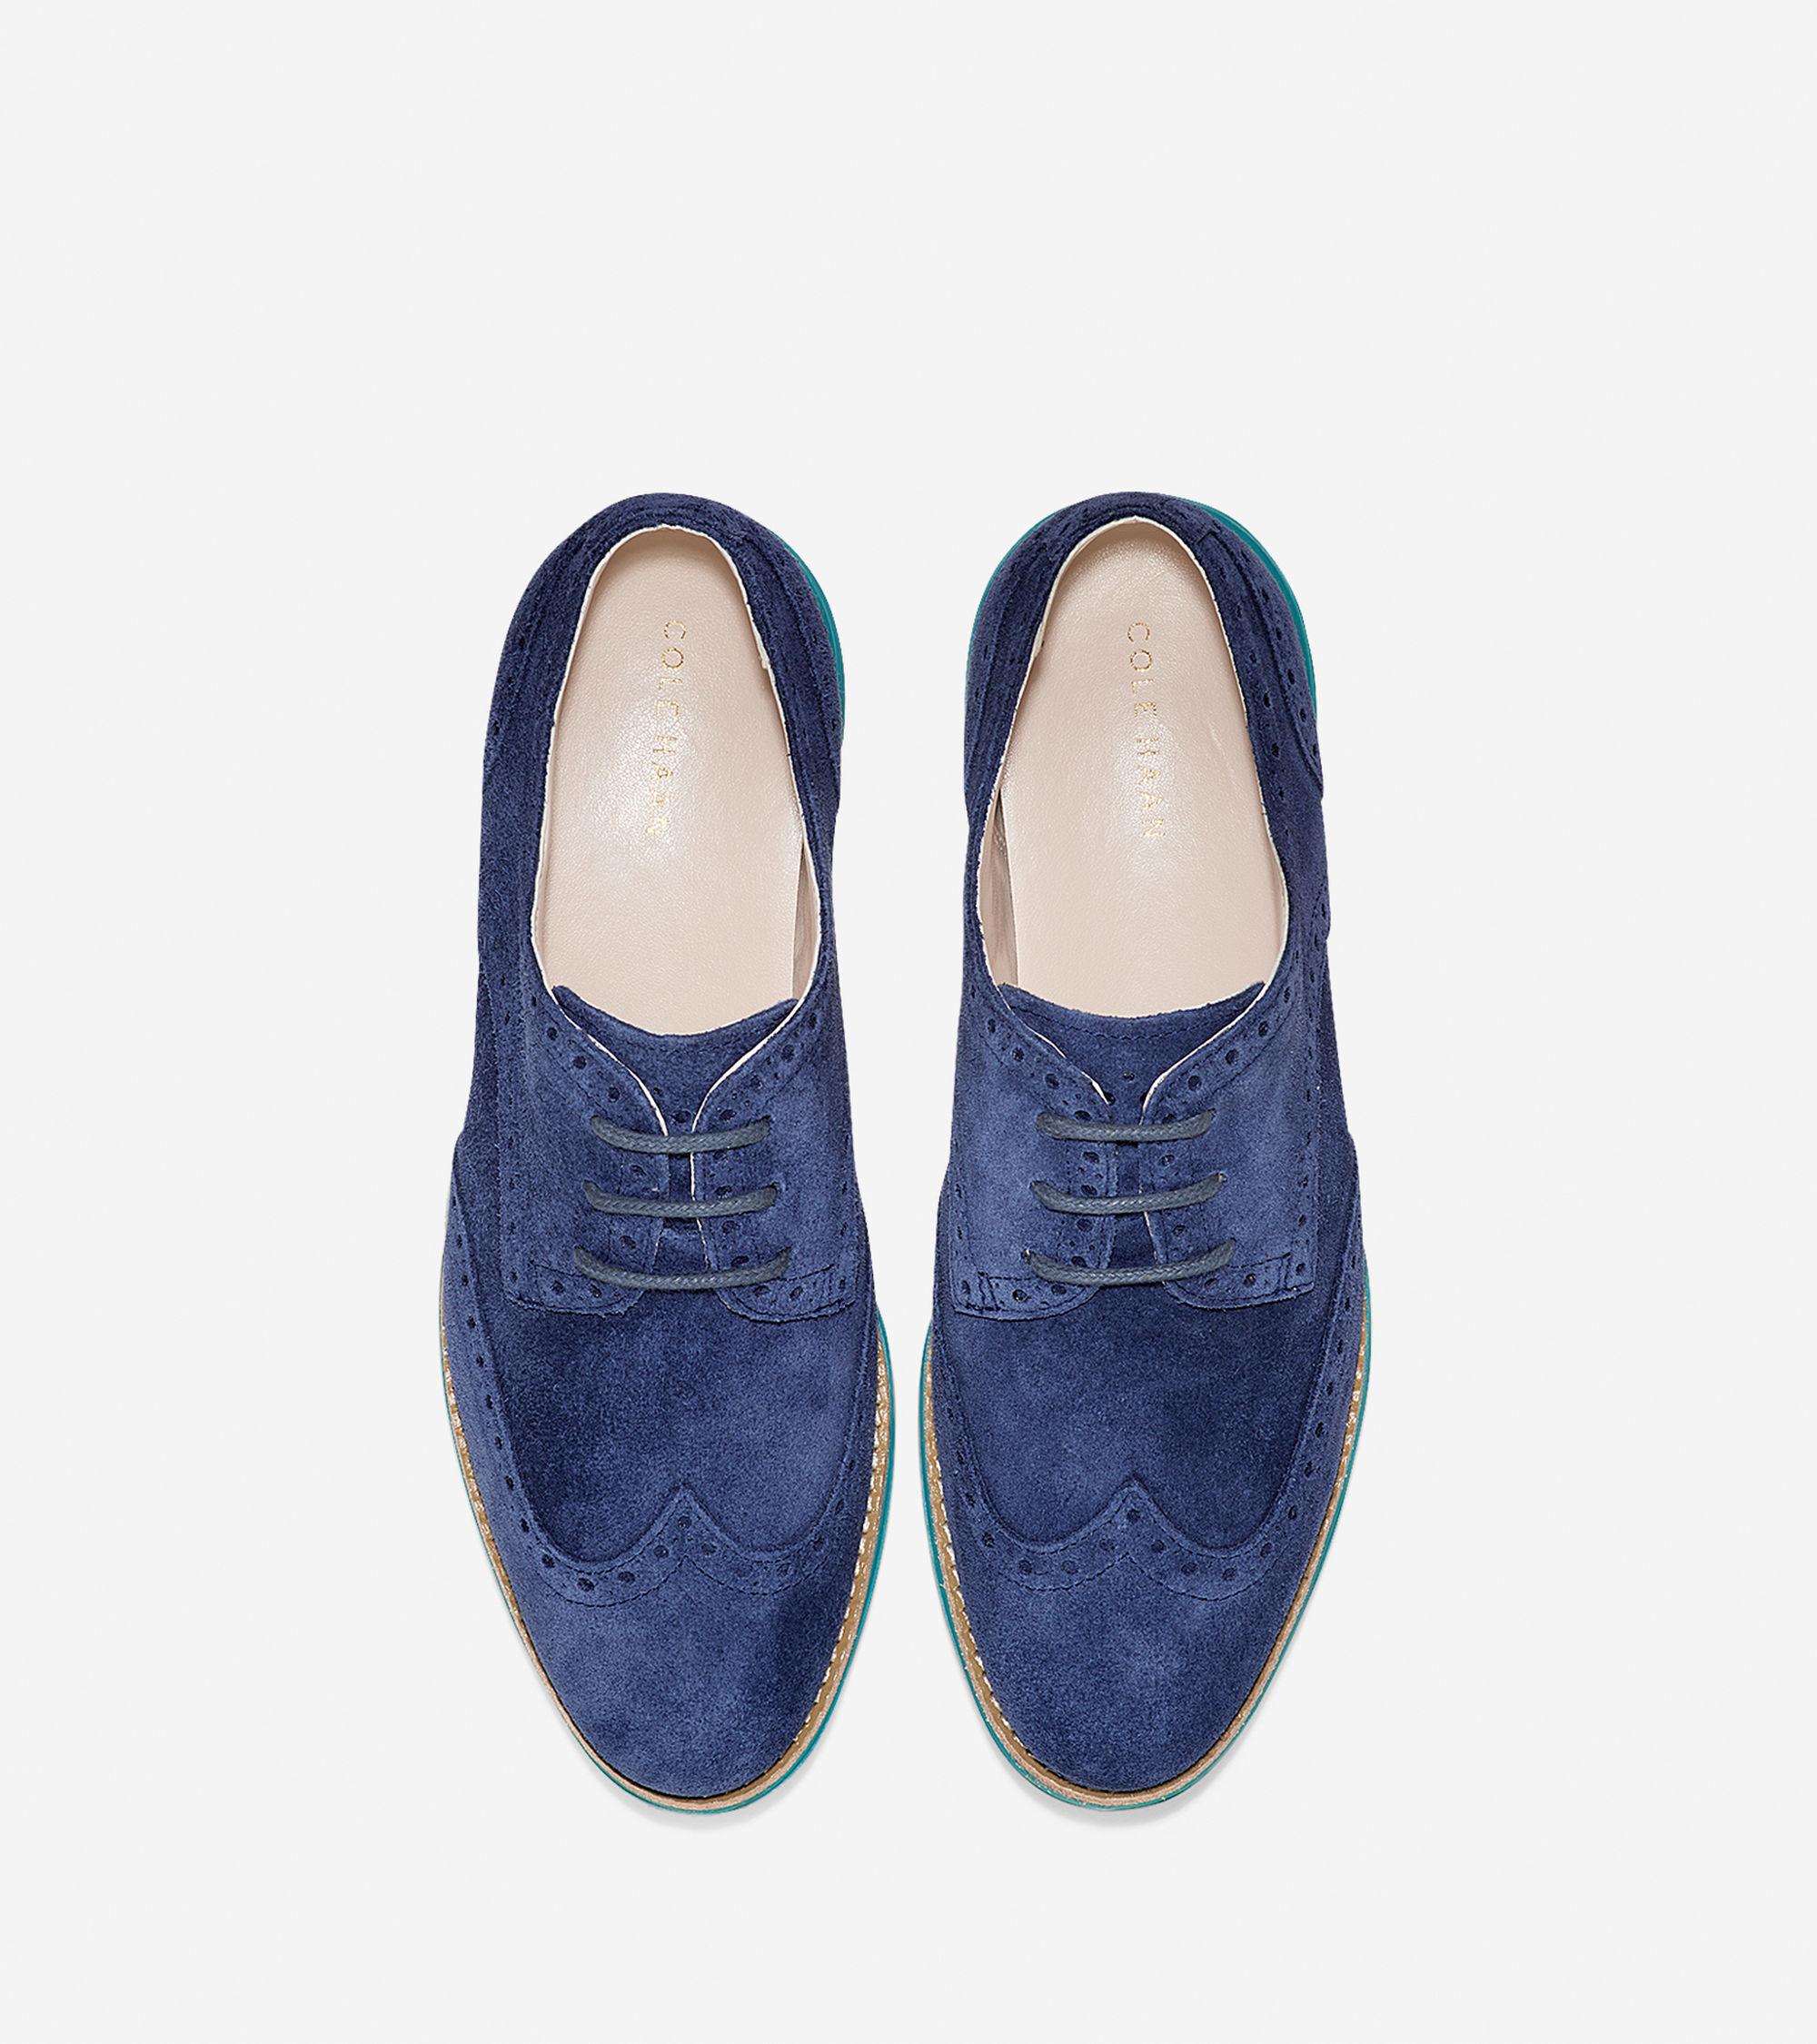 Waterproof Wingtip Women Shoe